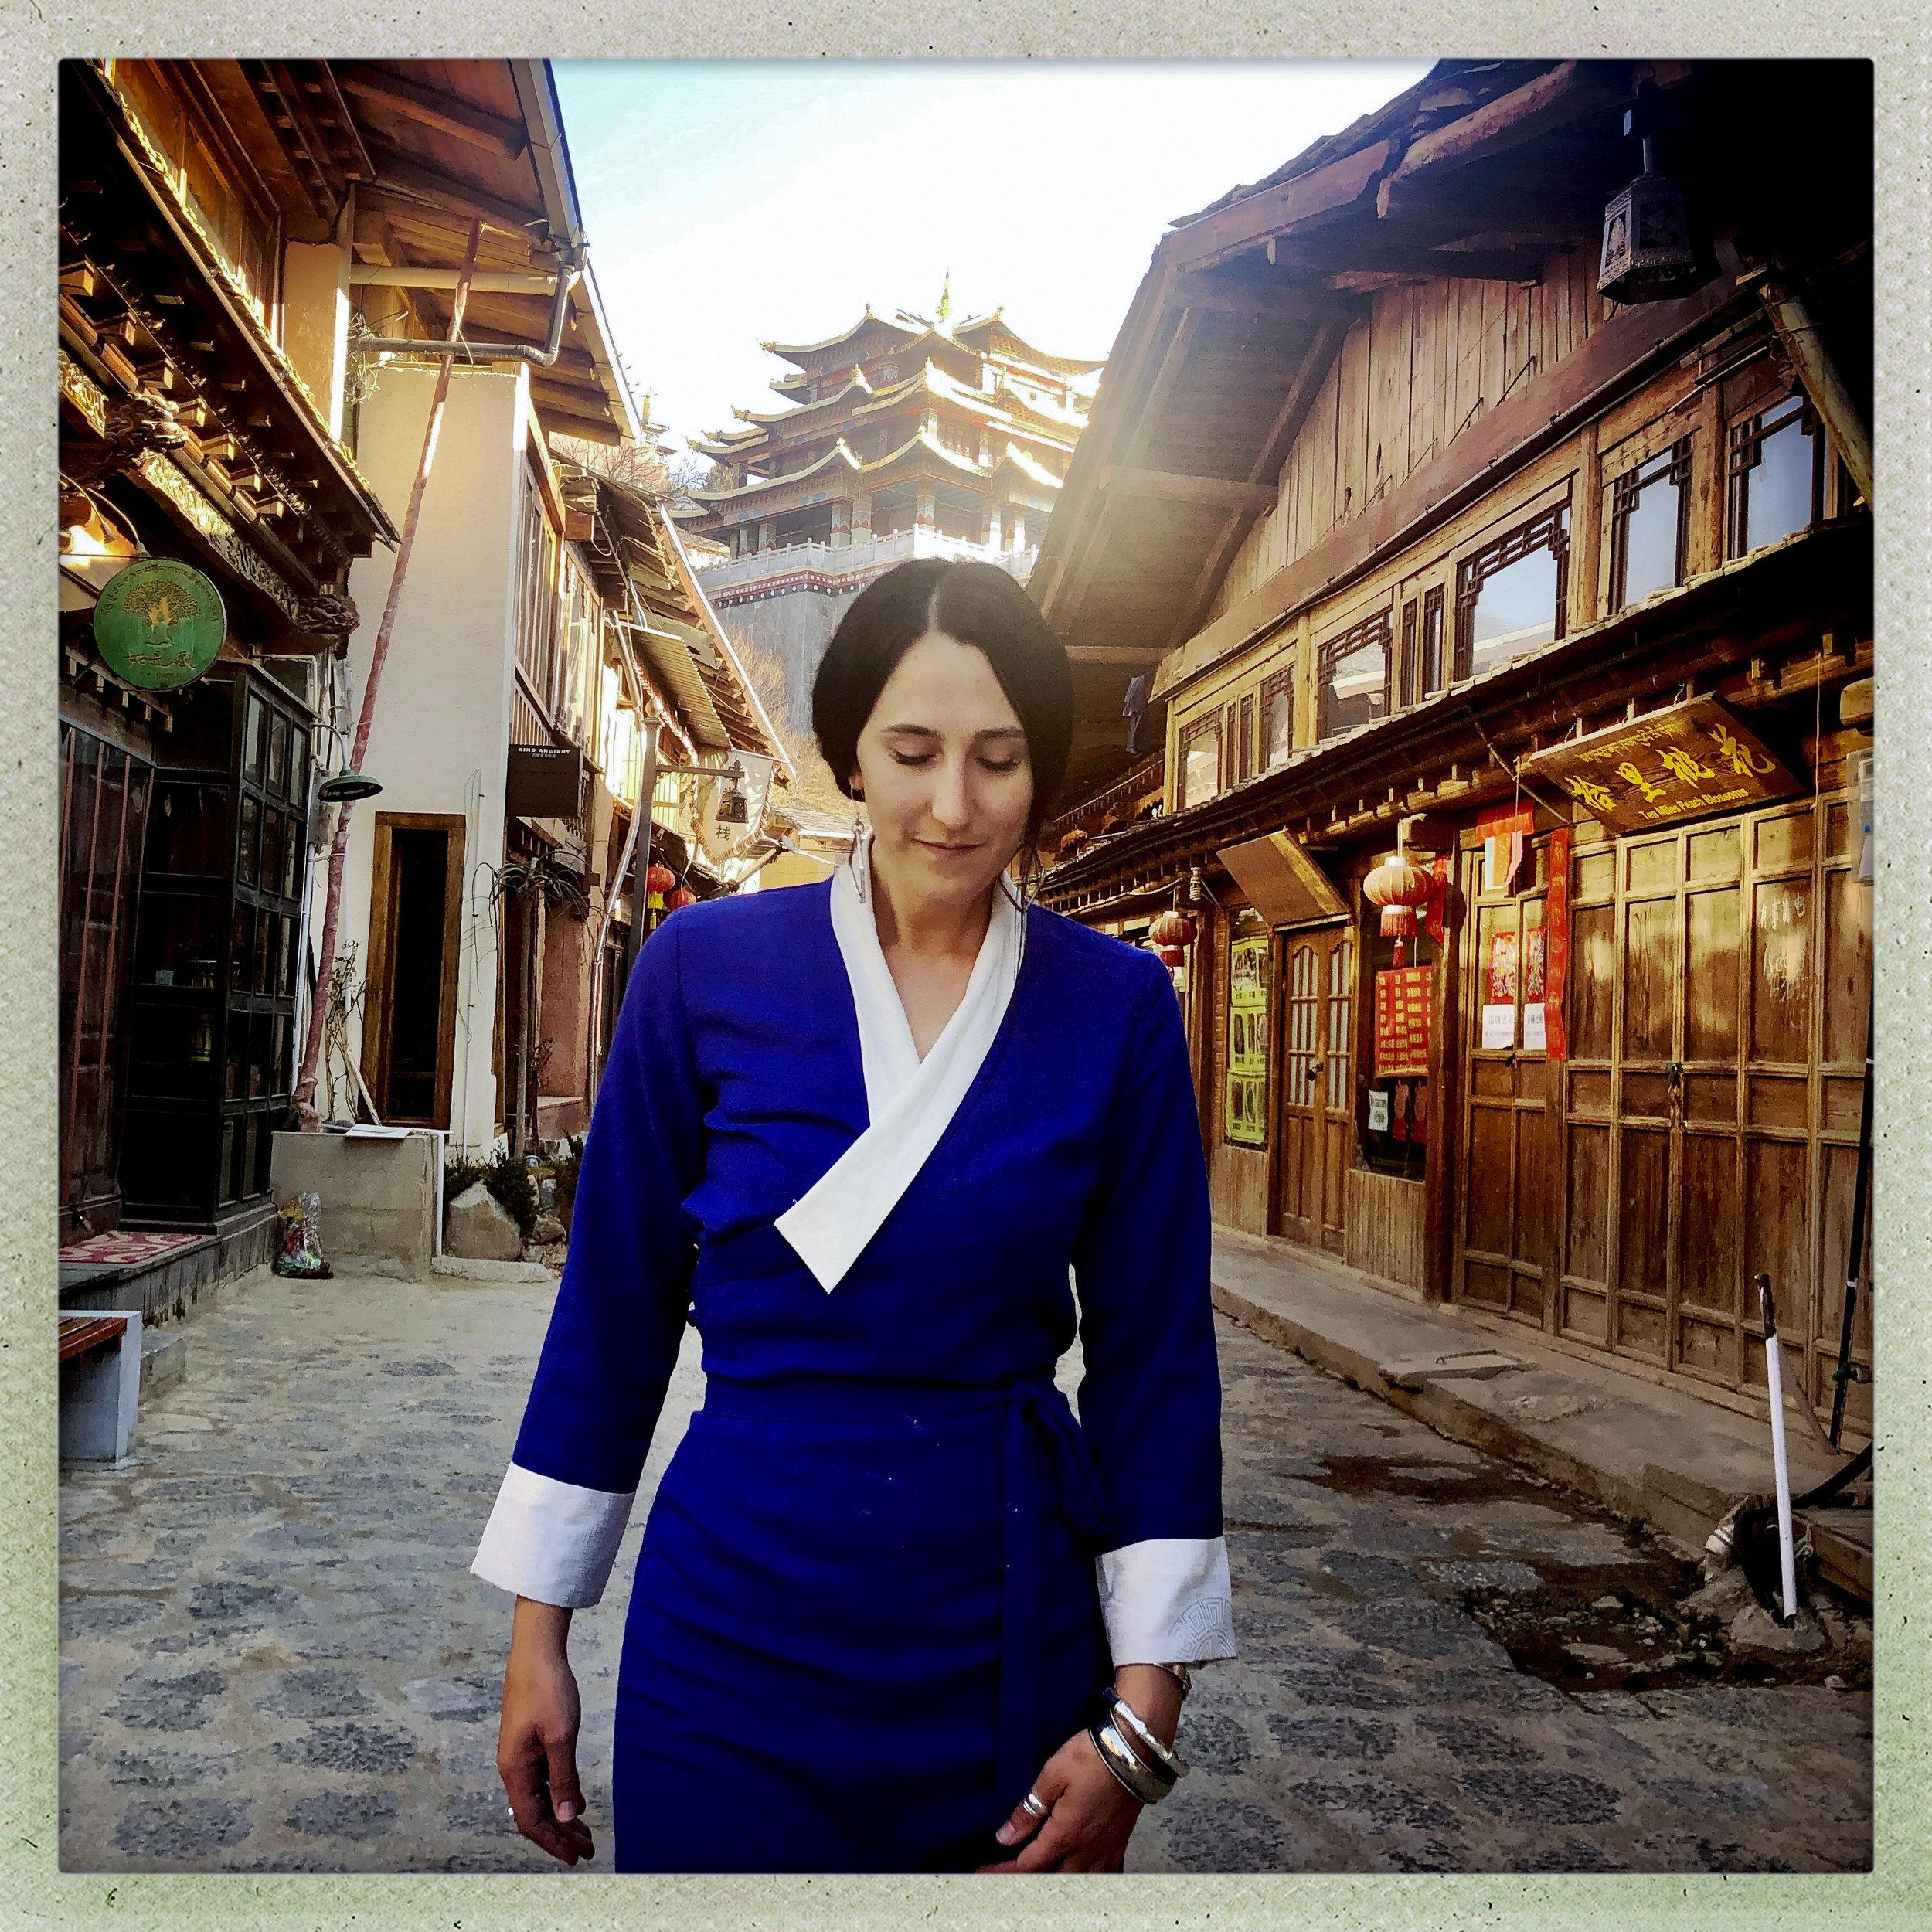 Jenna wearing a traditional Tibetan chupa dress in Azure Blue. Photo collaboration with Douglas Beasley